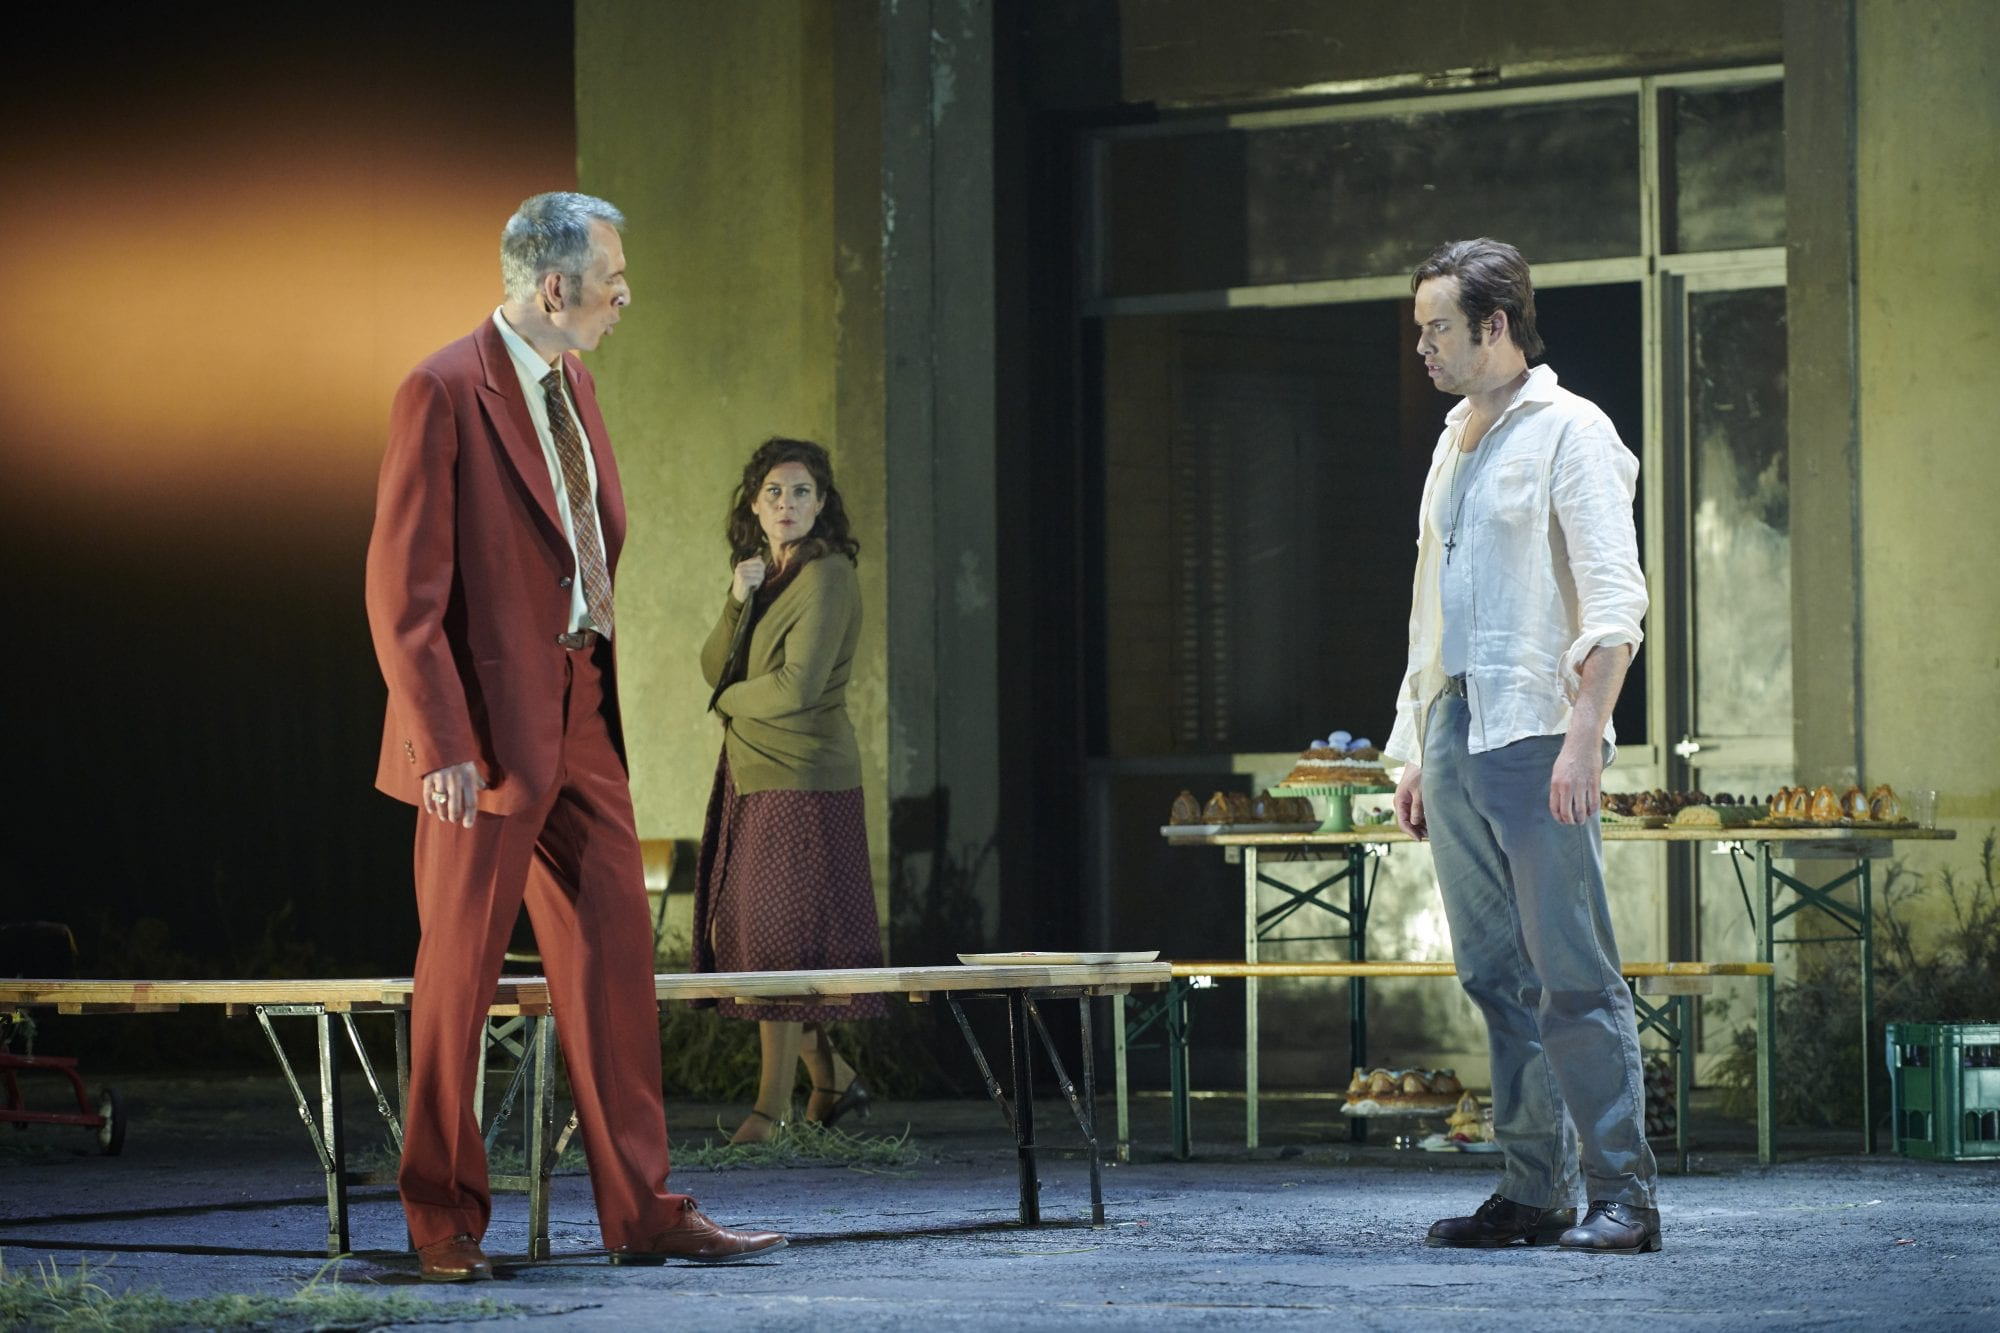 Recension: Cavalleria Rusticana & Pagliacci på GöteborgsOperan